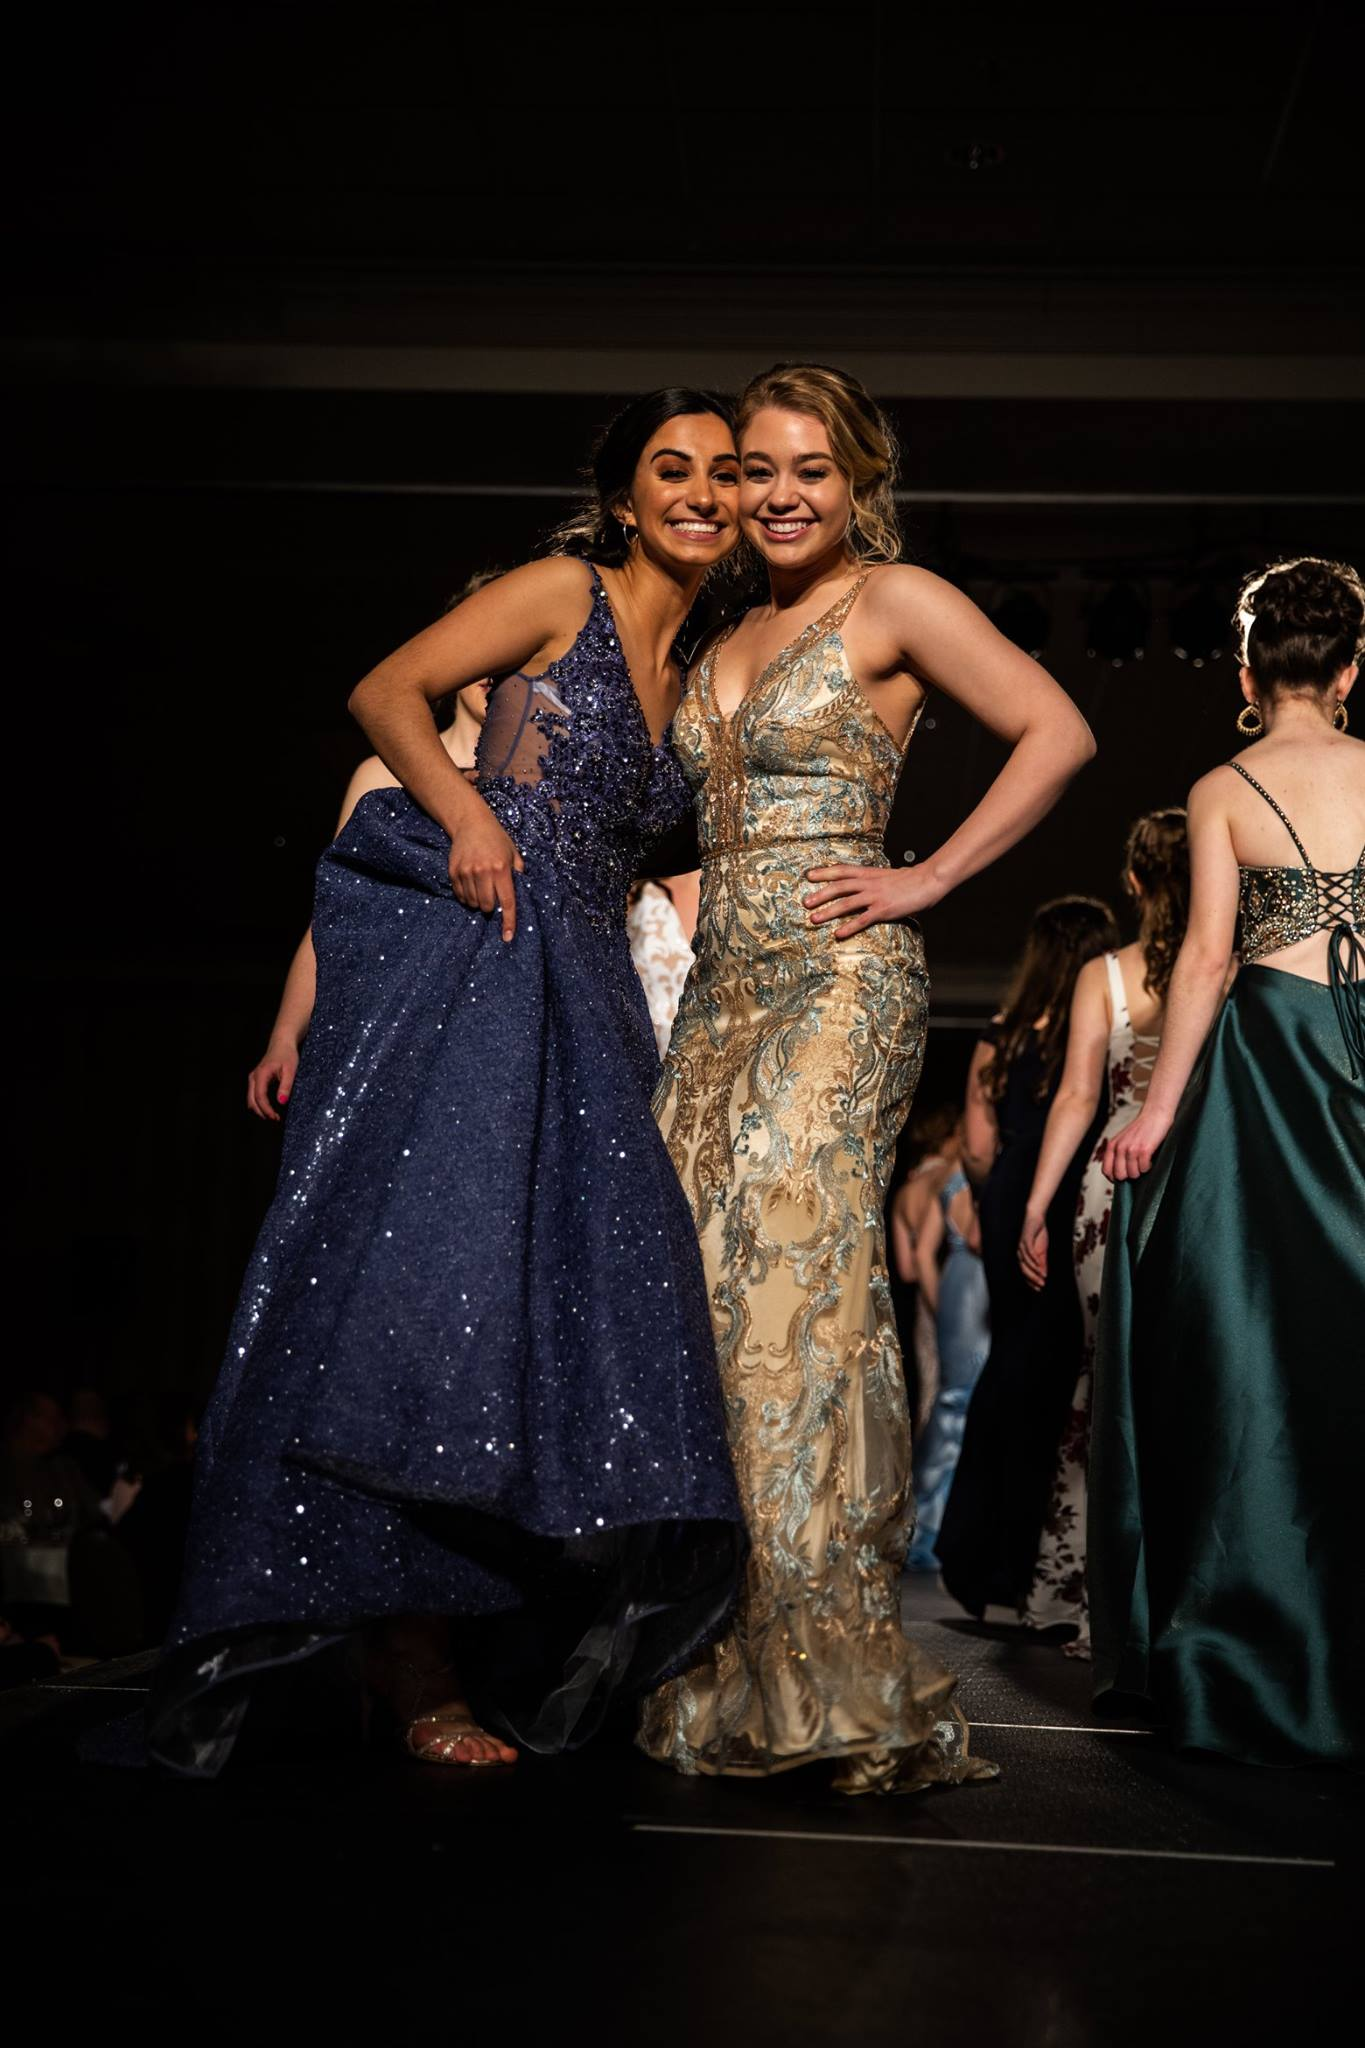 Lutheran_North_High_School_Macomb_Michigan_LHN_Fashion_Show_2019_Seniors (15).jpg